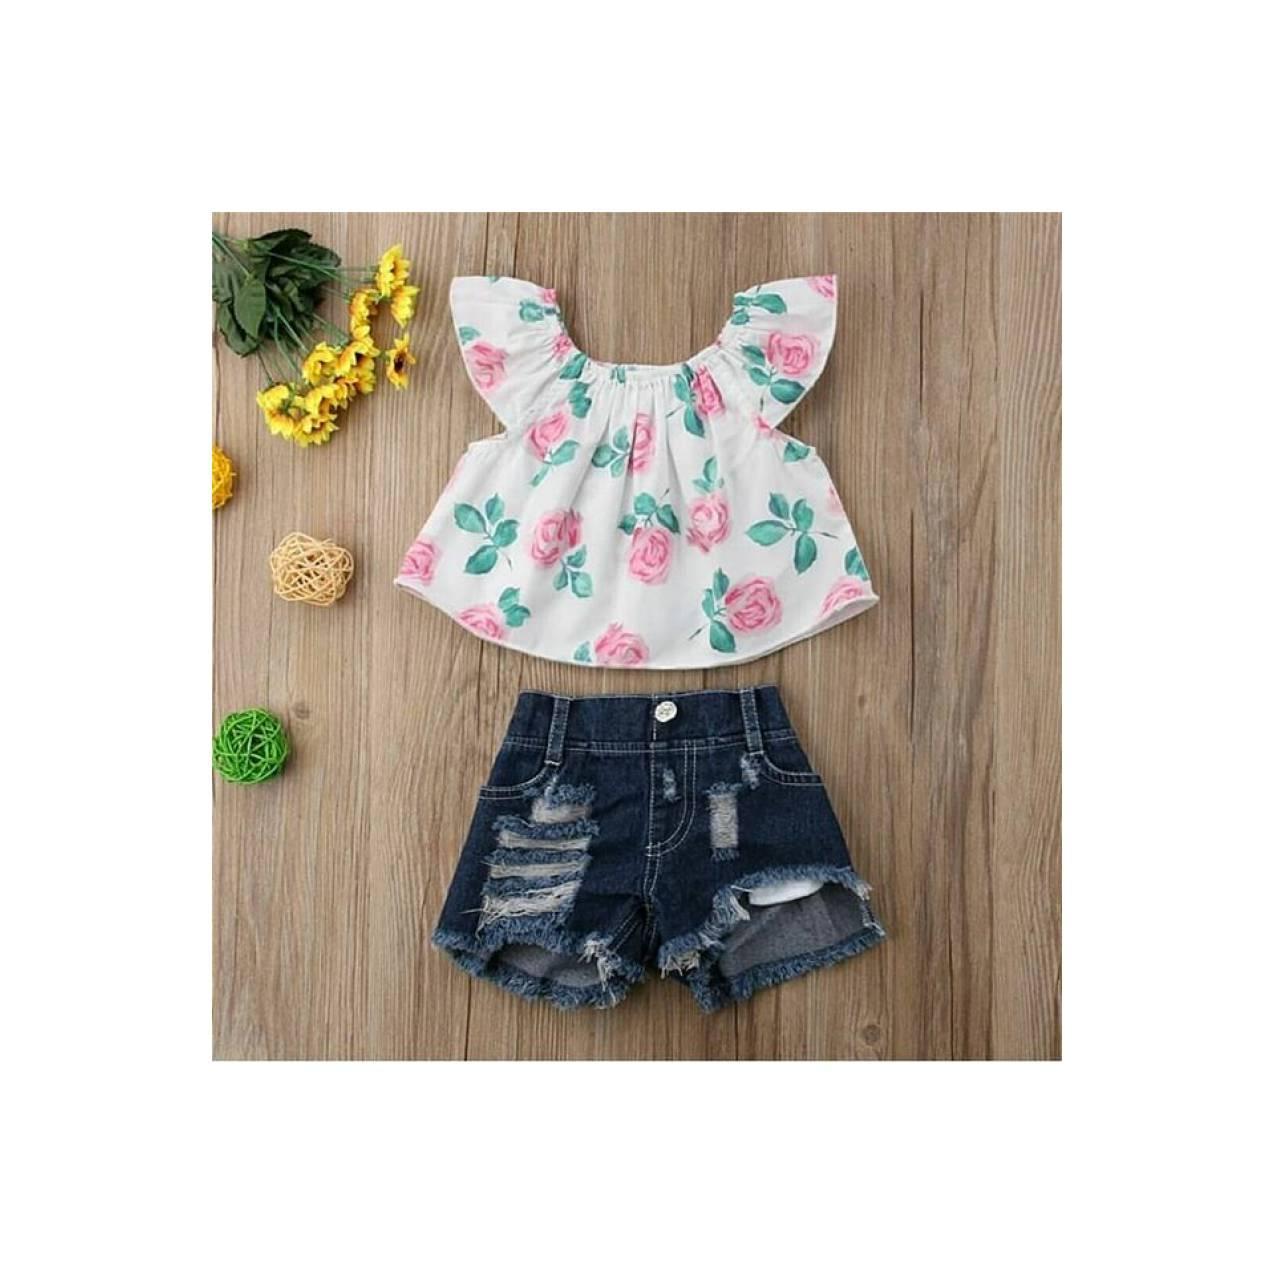 Setelan 2in1 baby girl sabrina flower celana jeans import